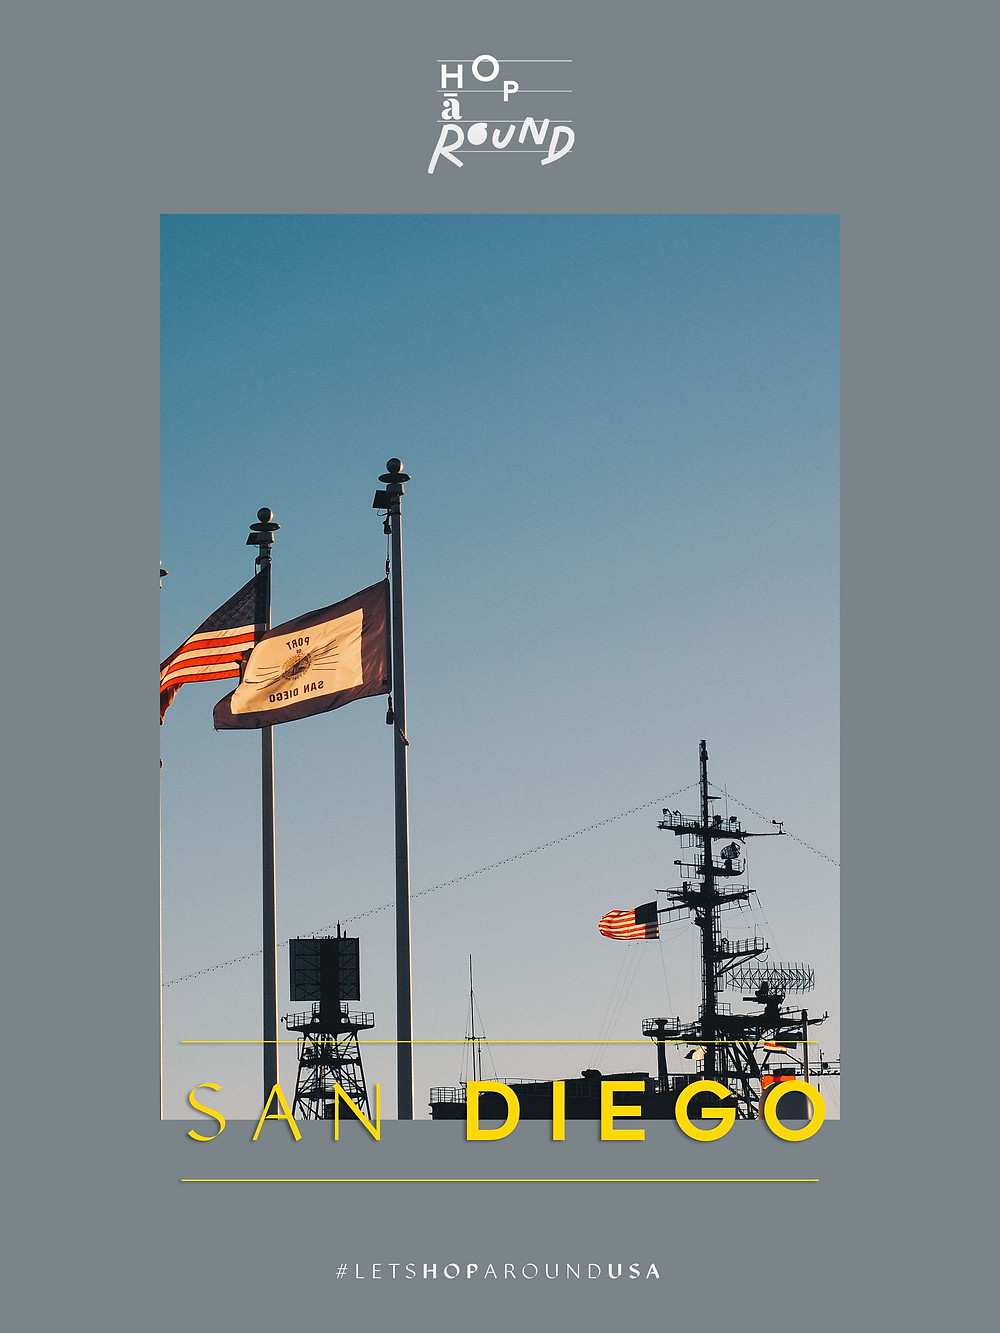 san diego เที่ยวอเมริกา โรดทริป America West Coast Road Trip USA เที่ยวอเมริกาด้วยตัวเอง เช่ารถขับ รอบอเมริกา ซานฟรานซิสโก แคลิฟอเนียร์ ซีแอตเทิล ลอสแองเจลิส ซานดิเอโก้ พอร์ทแลนด์ Portland San Diego Los Angeles Seattle California ร้านอร่อย ร้านอาหาร คาเฟ่ ช็อปปิ้ง ชอปปิ้ง จุดน่าแวะในอเมริกา ขับรถรอบอเมริกา